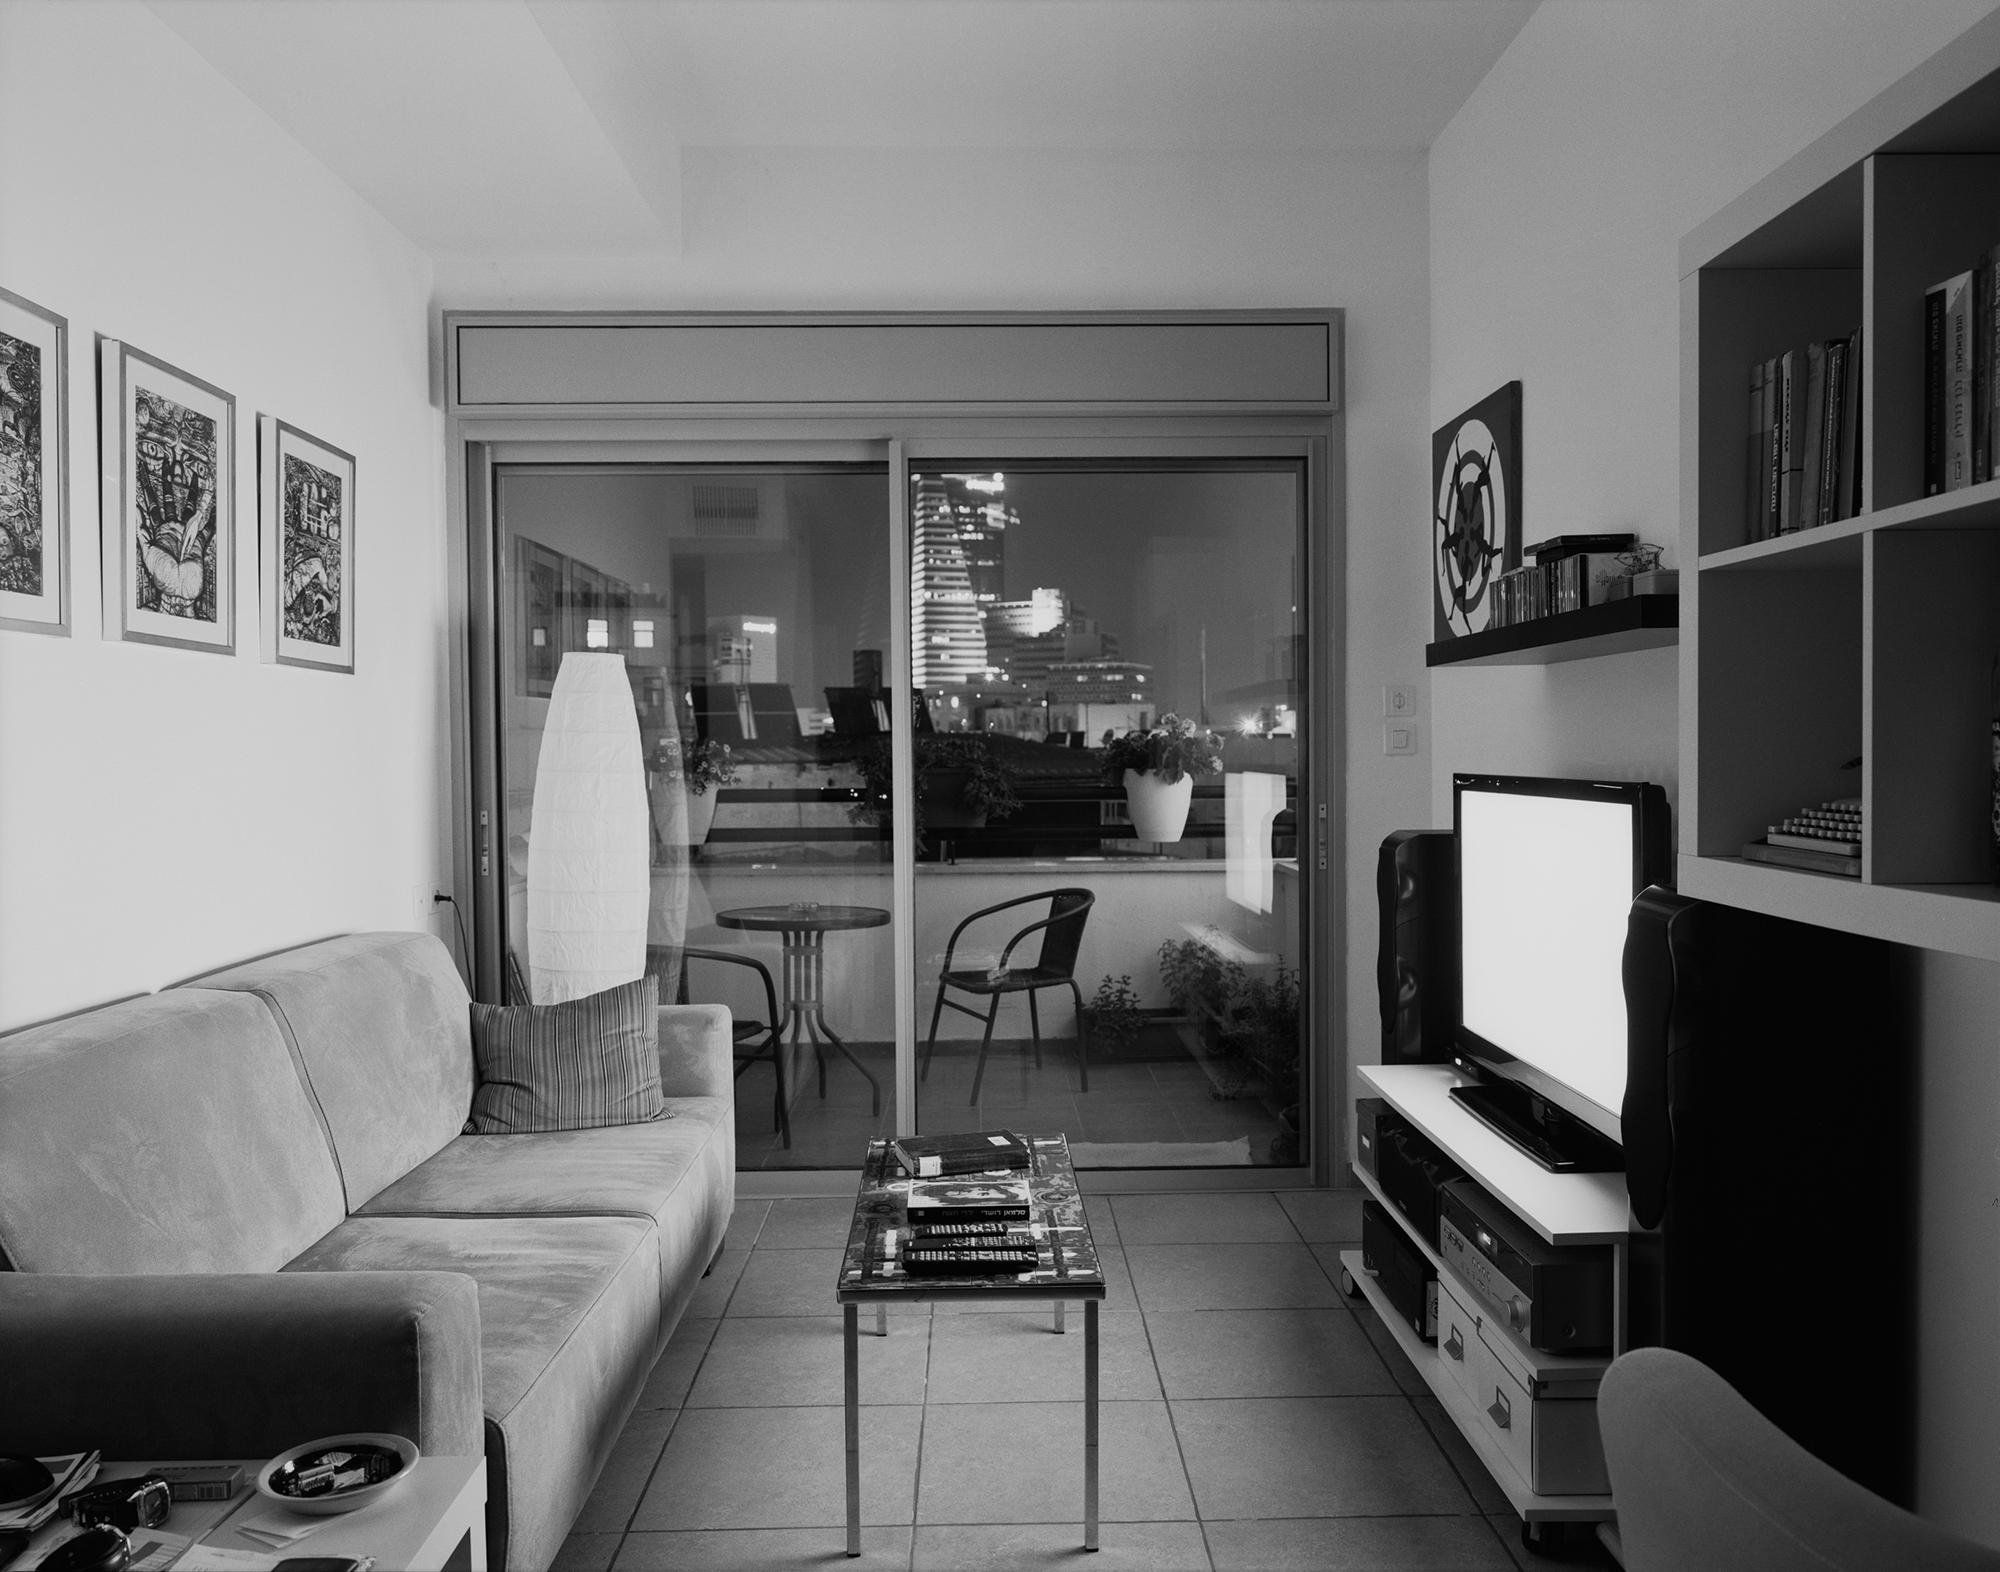 O. living room. Neve Sha'anan. Tel Aviv 2015